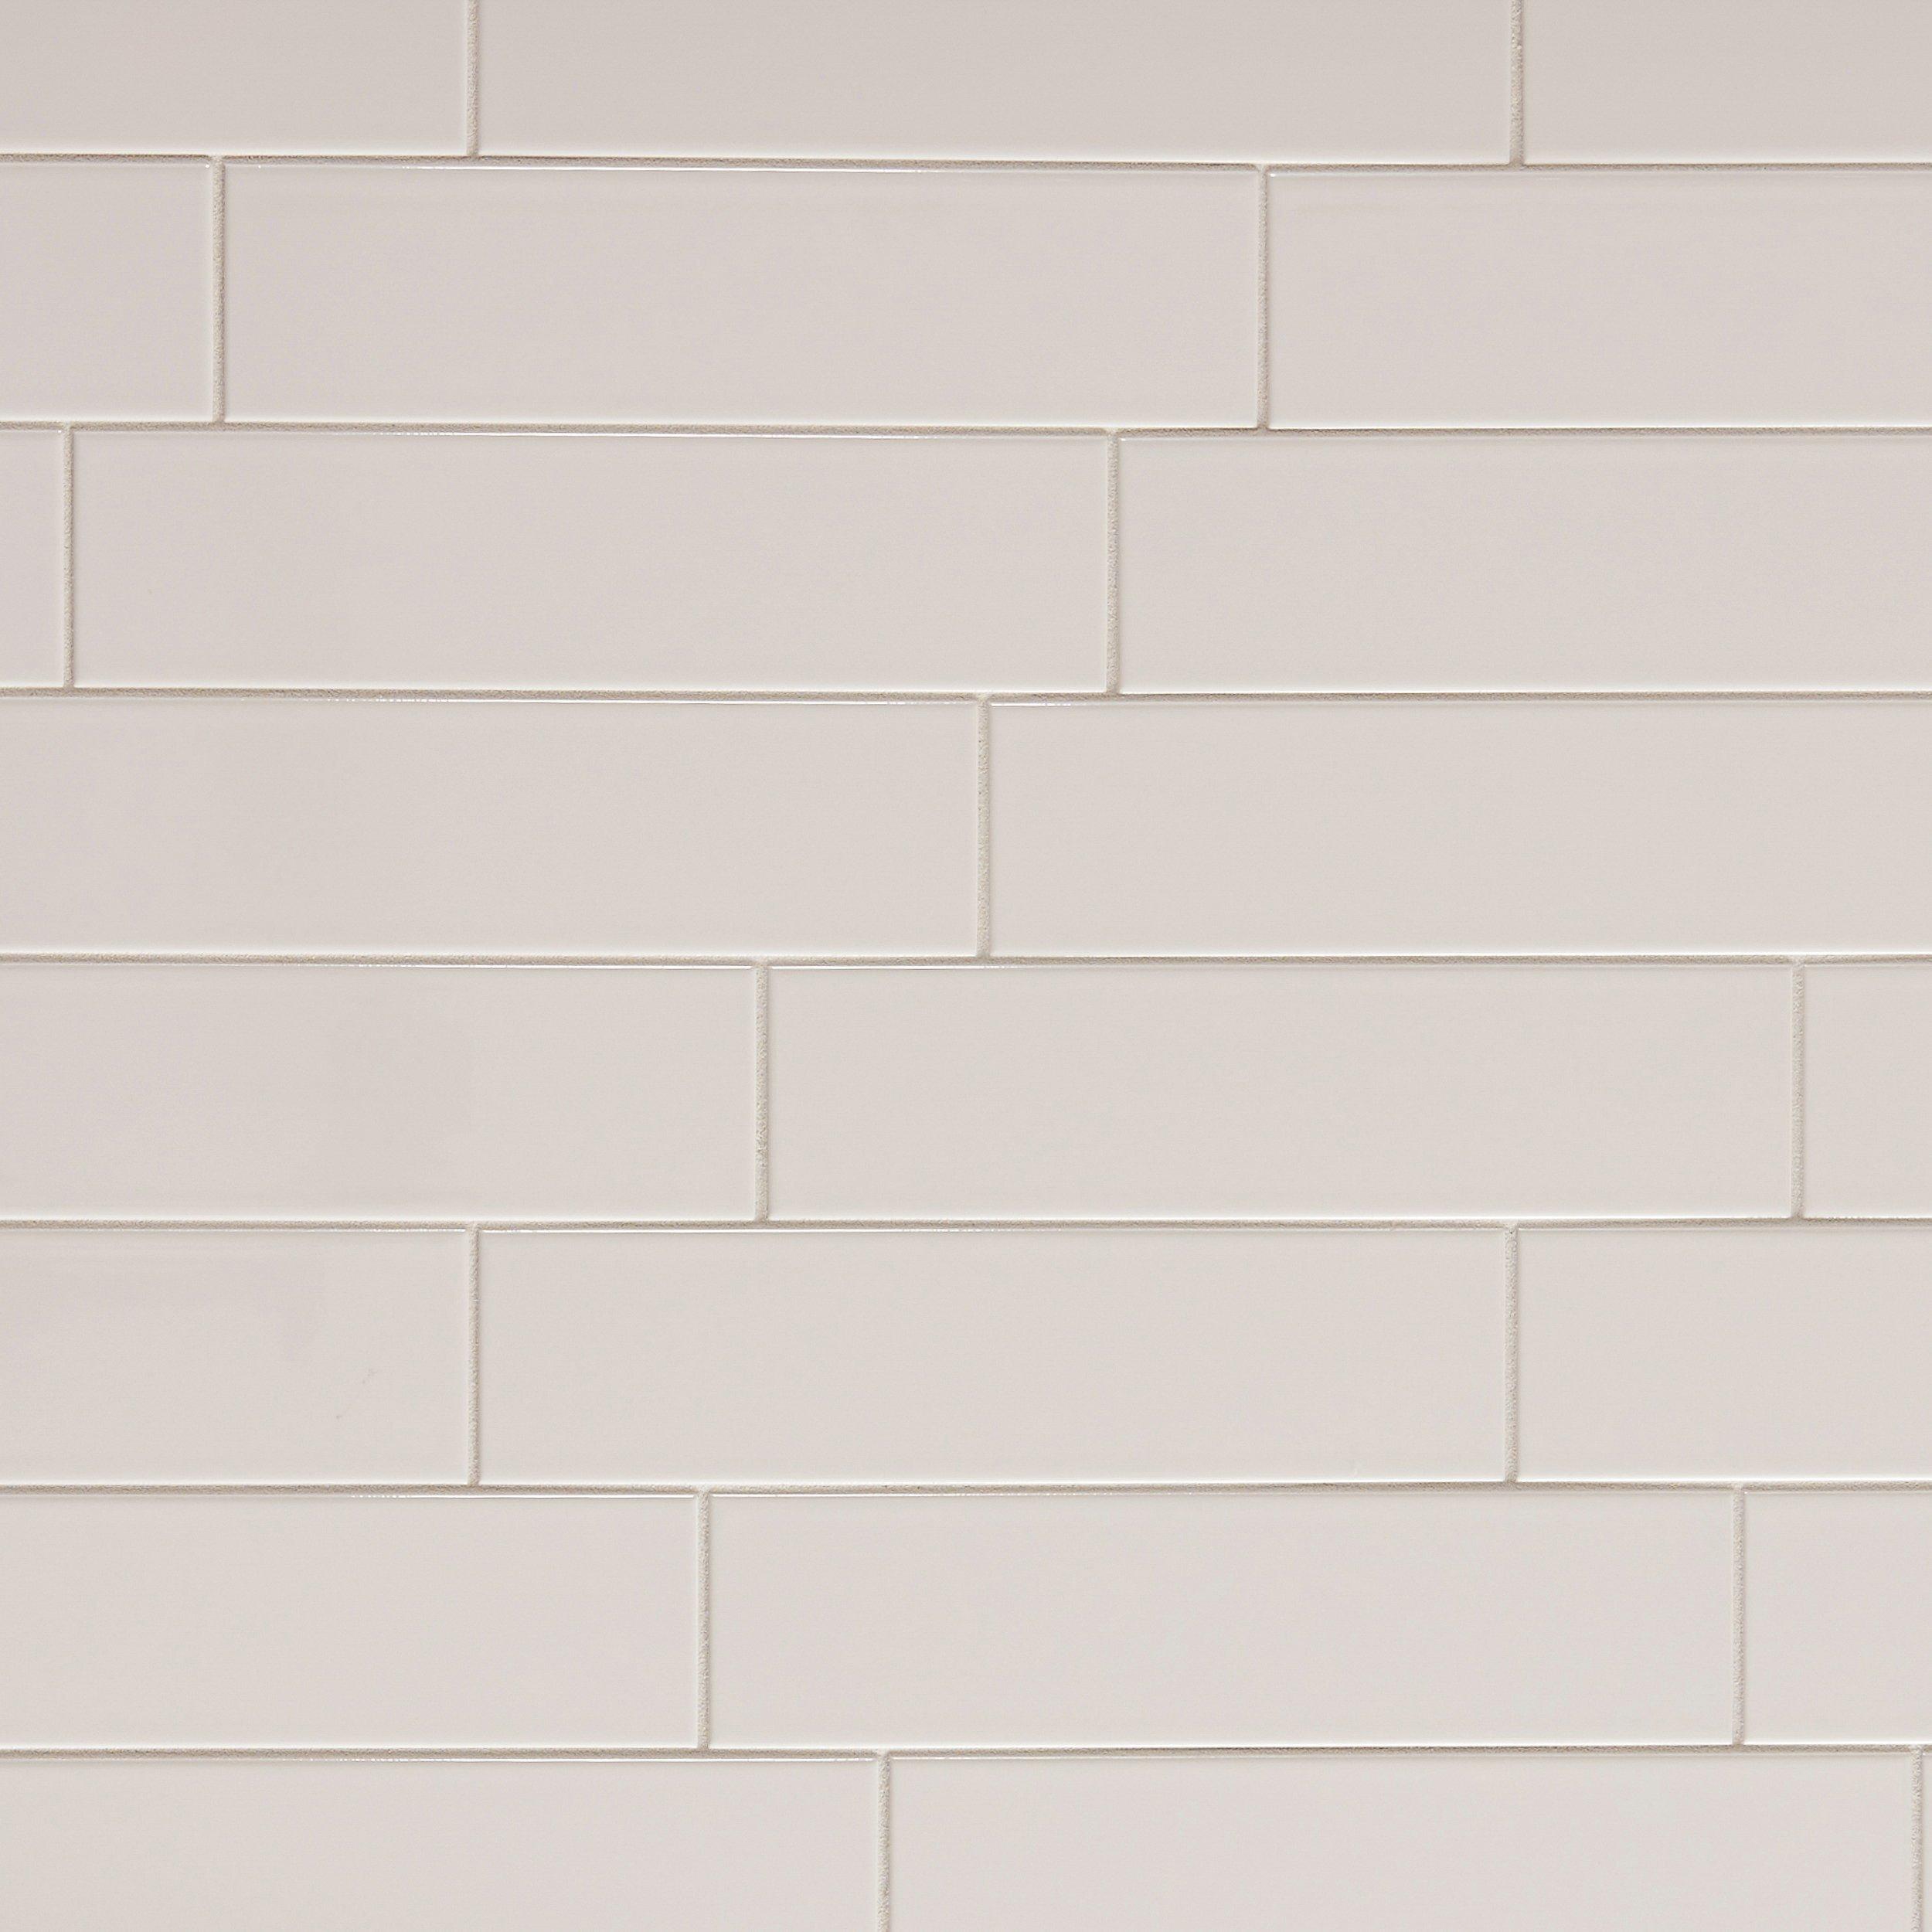 Metro White Polished Ceramic Tile 4 X 16 100139302 Floor And Decor